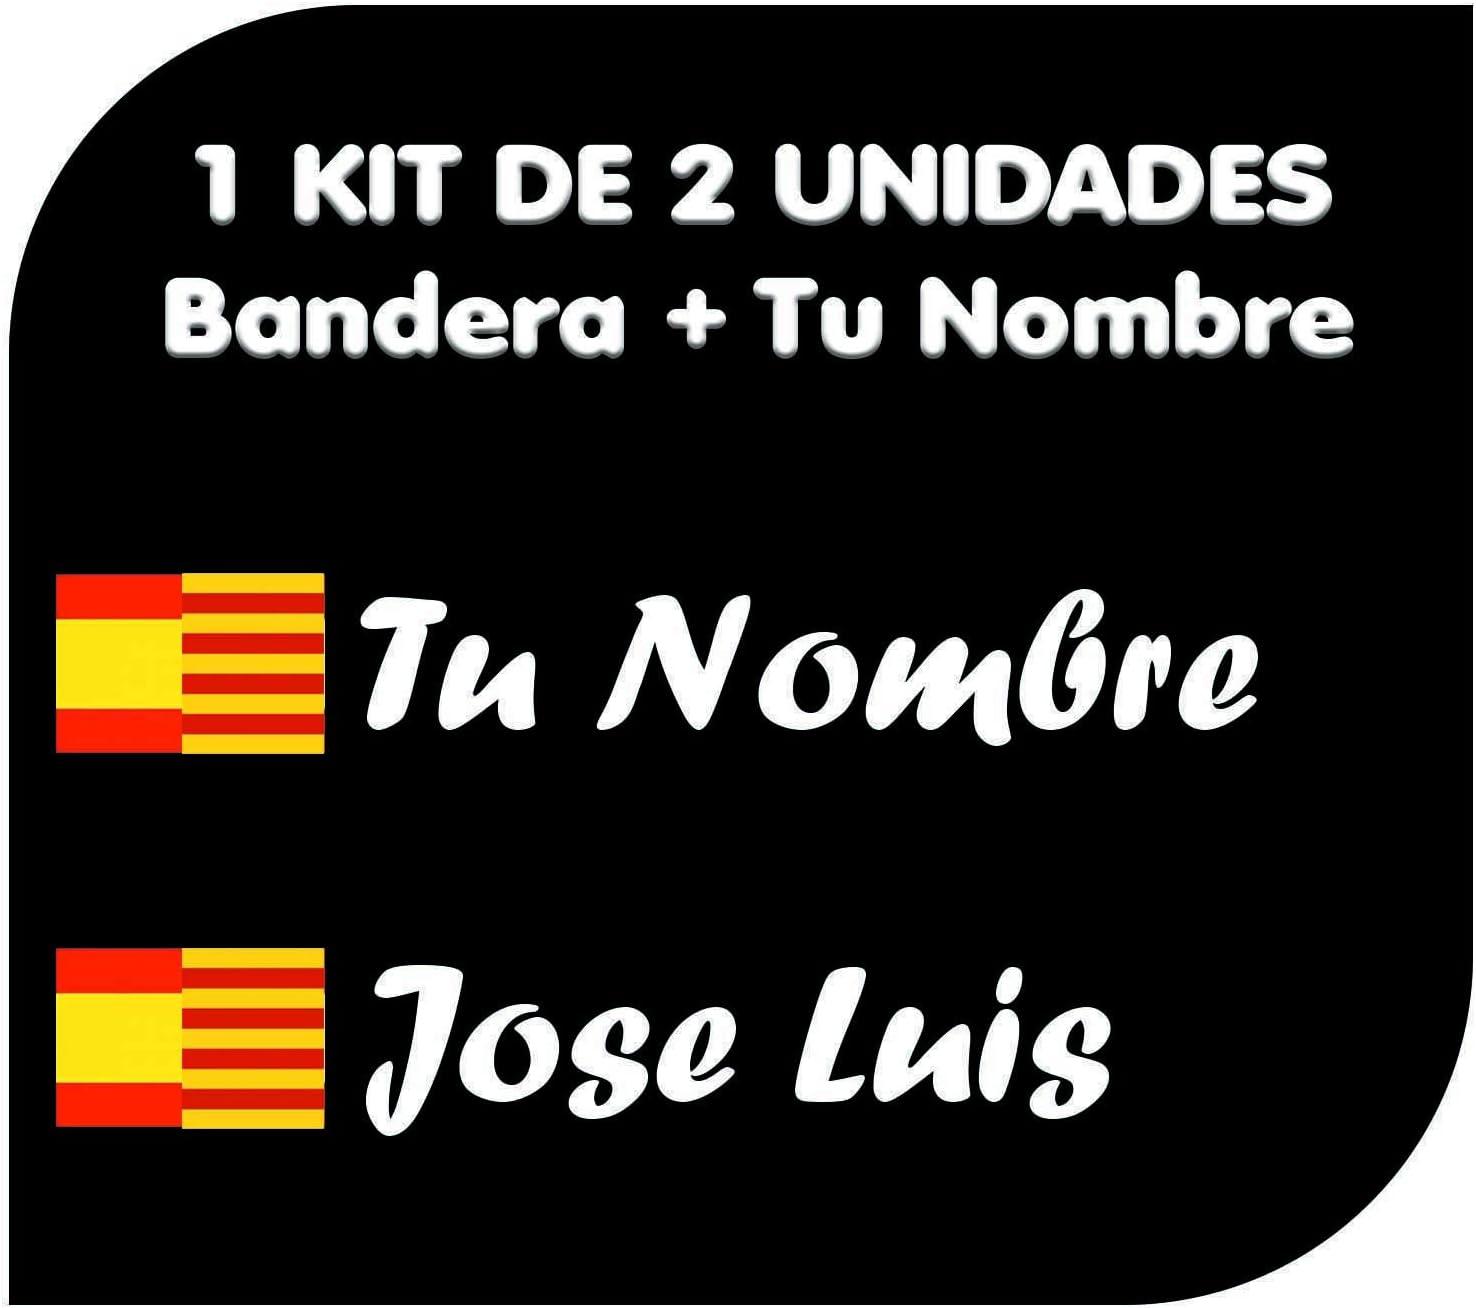 Pegatina Vinilo Bandera España Cataluña + tu Nombre - Bici, Casco, Pala De Padel, Tablas Skate, Coche, Moto, etc. Kit de Dos Vinilos (Blanco): Amazon.es: Coche y moto